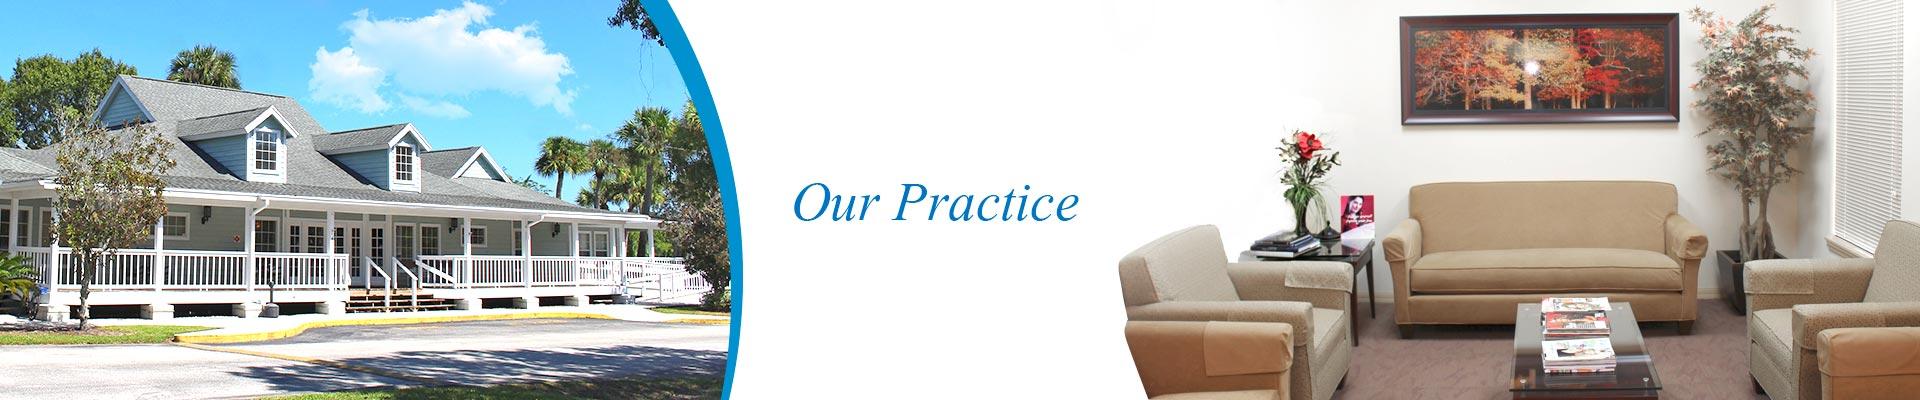 Associated Coastal ENT - Our practice